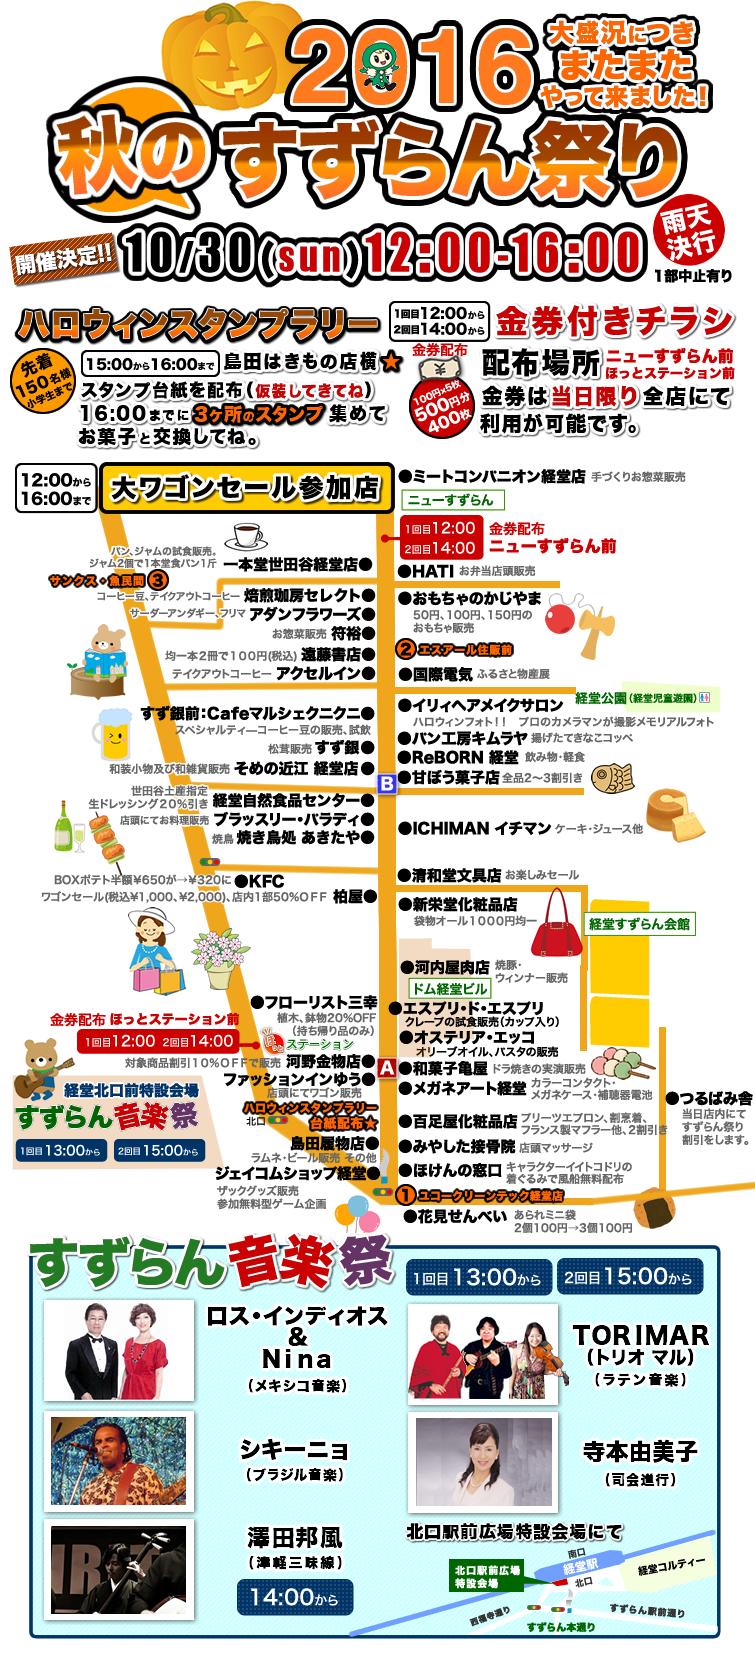 kyodosuzuran20160a